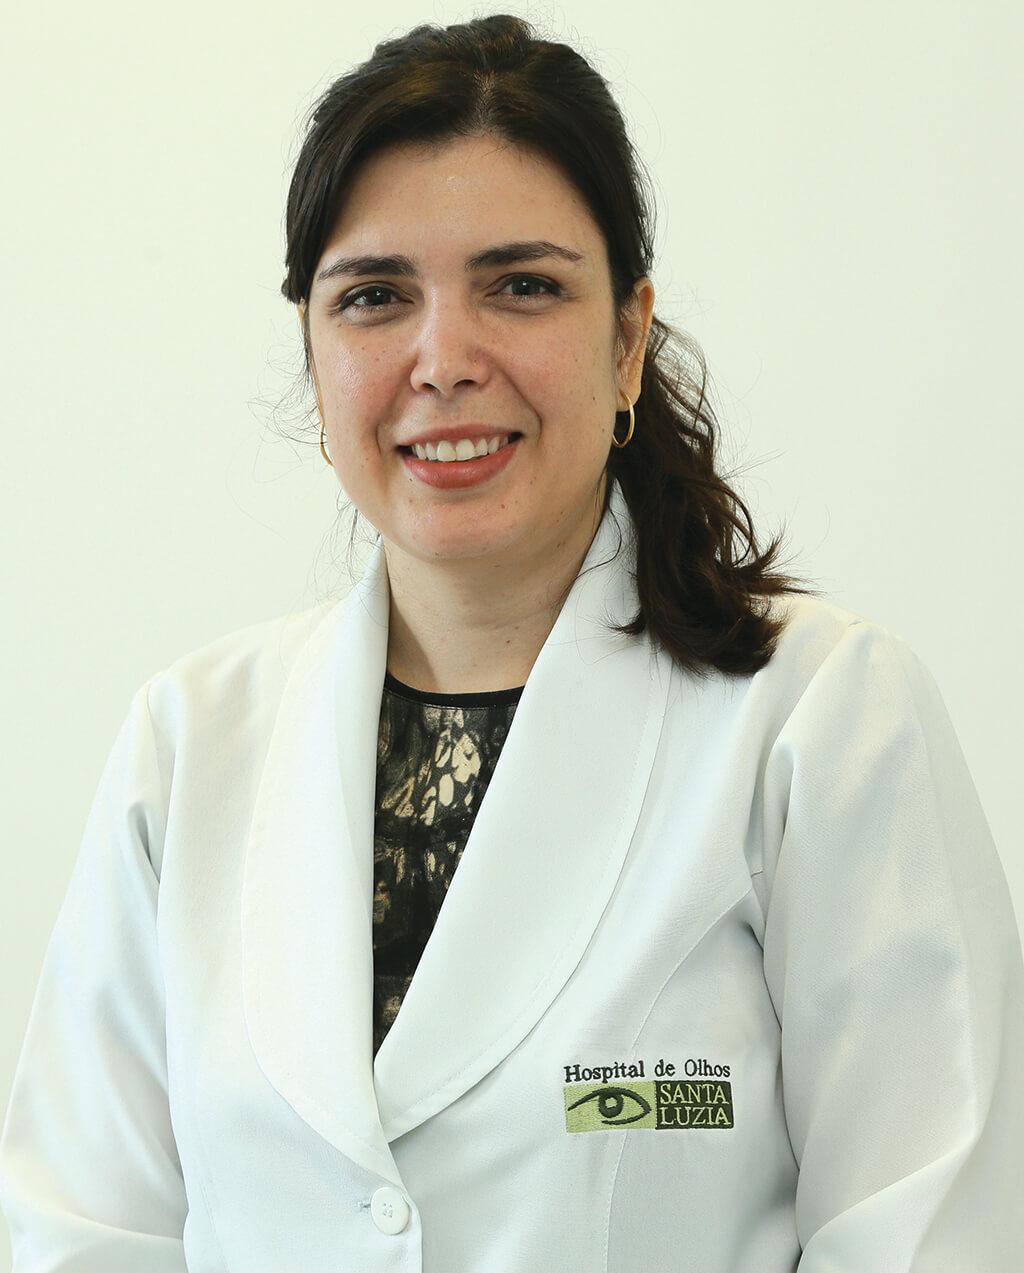 Cecília Pires